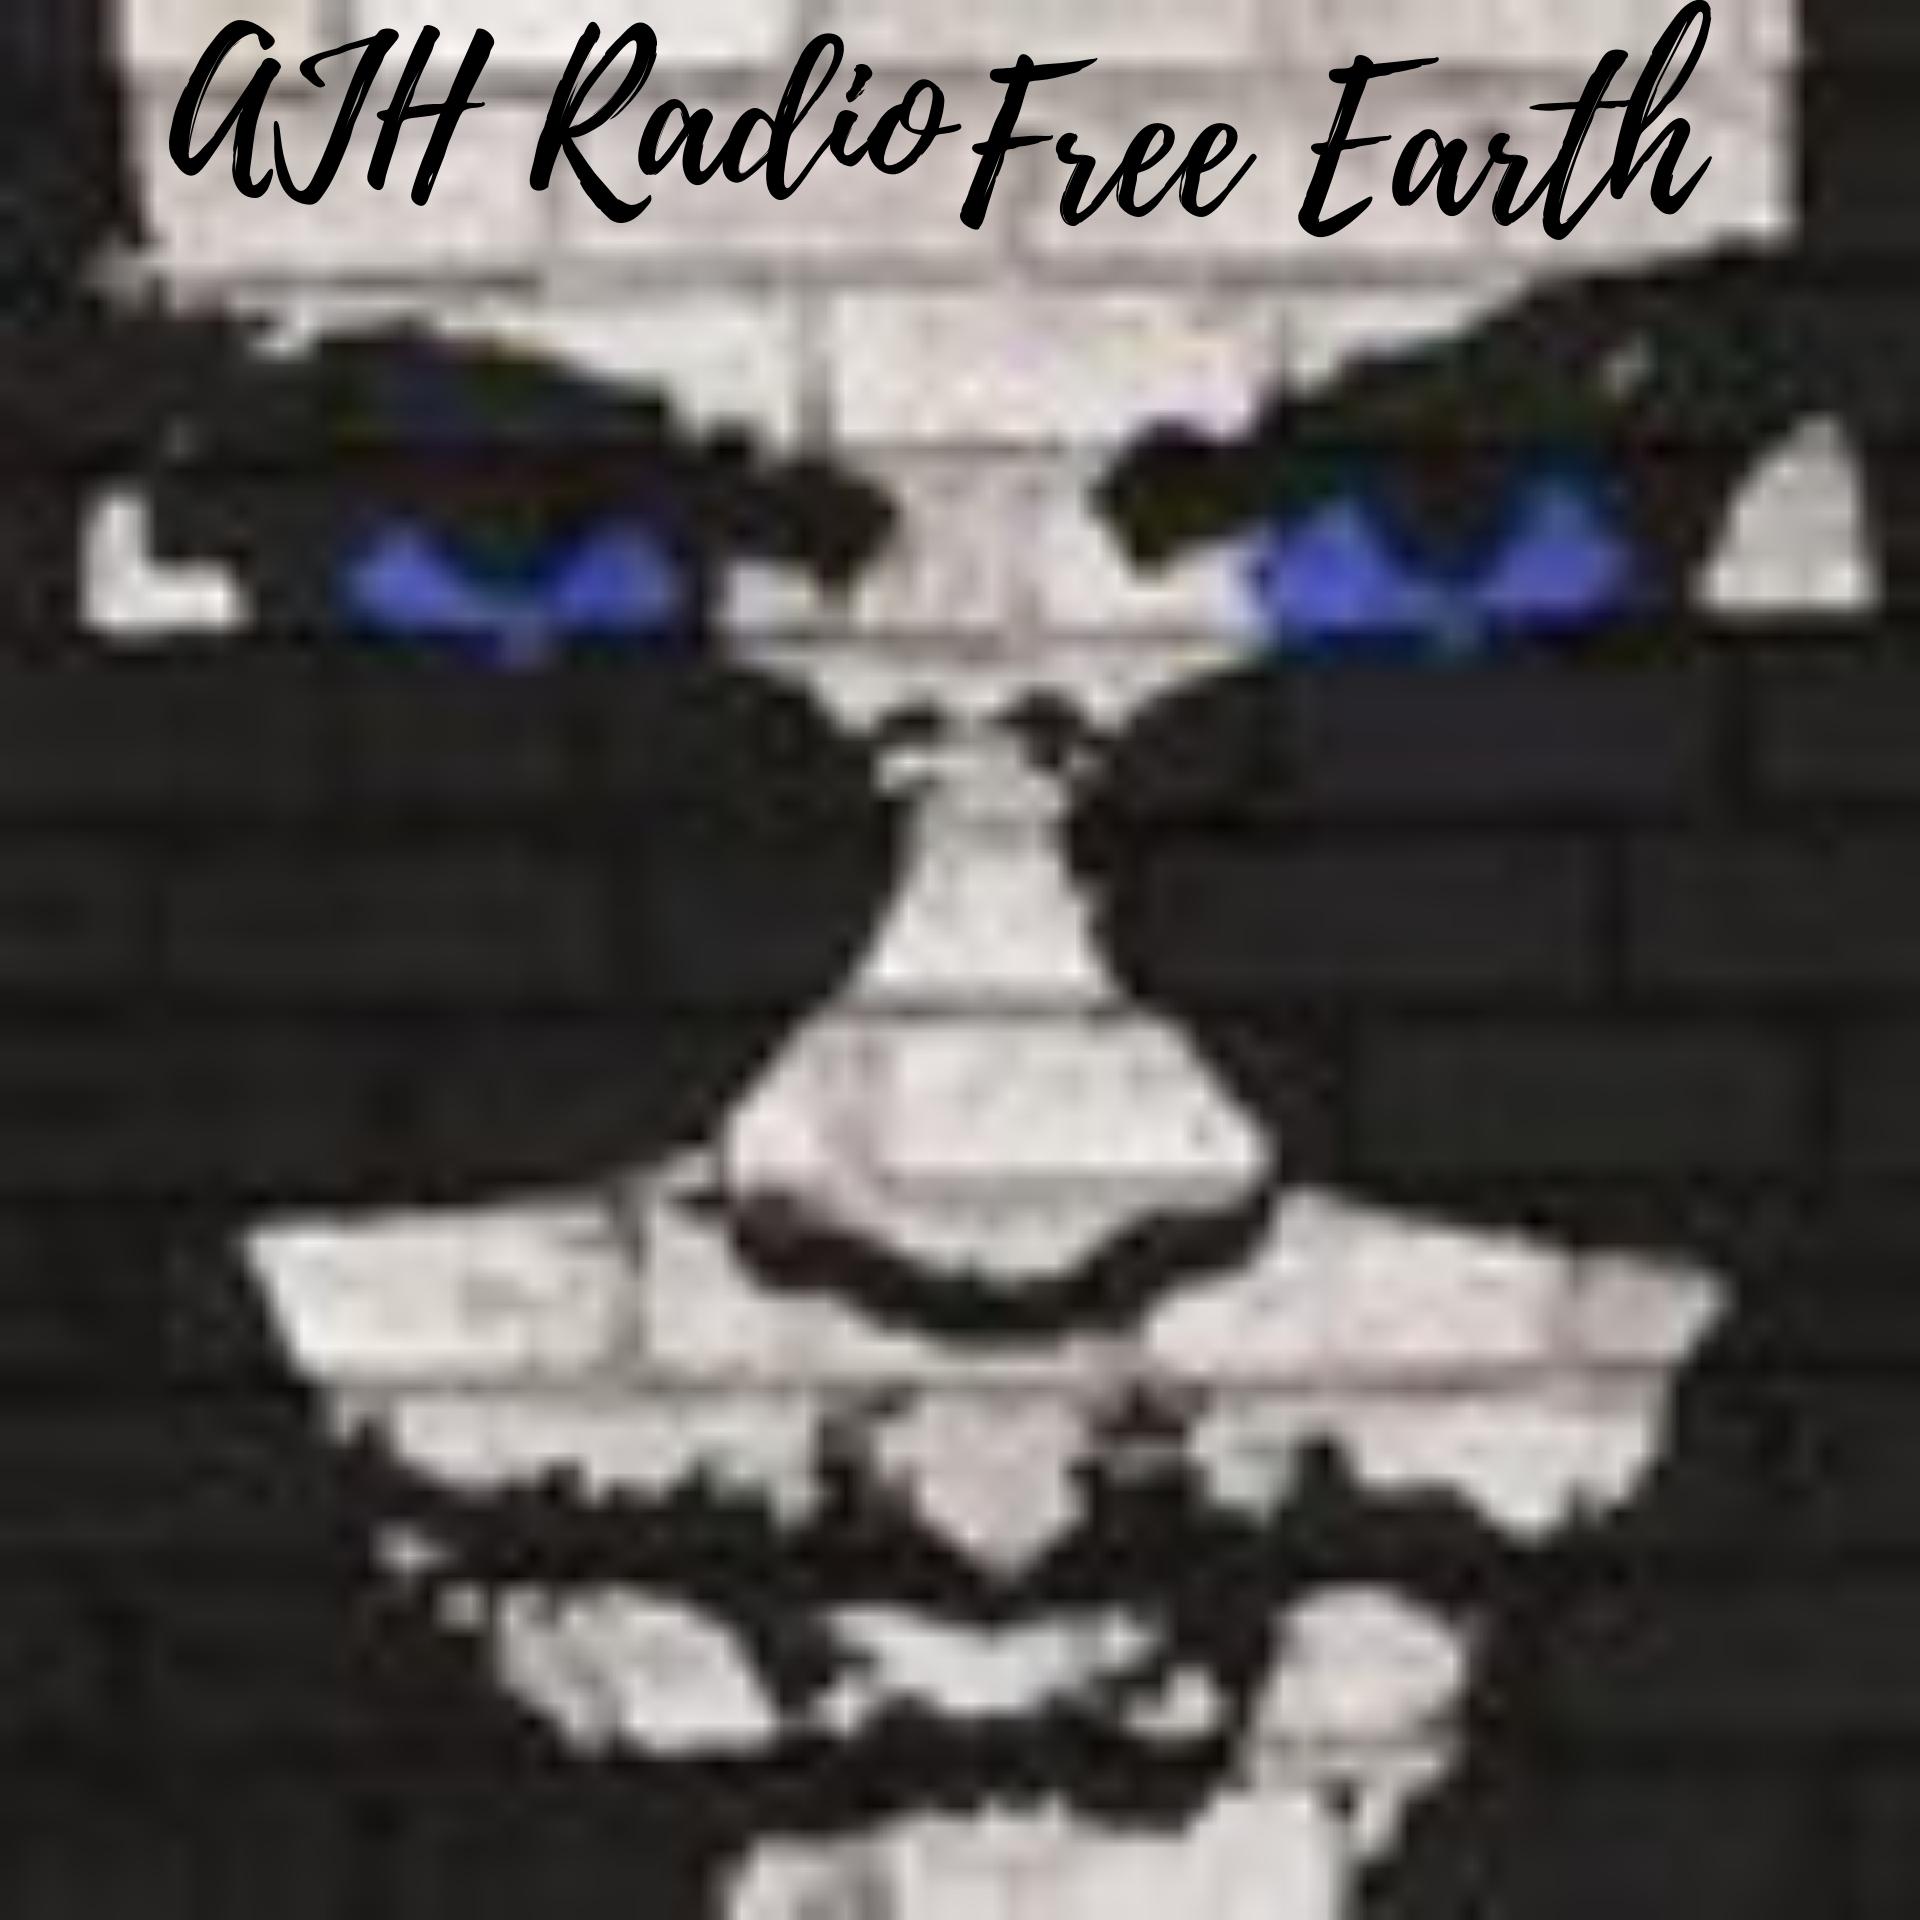 AJH Radio Free Earth